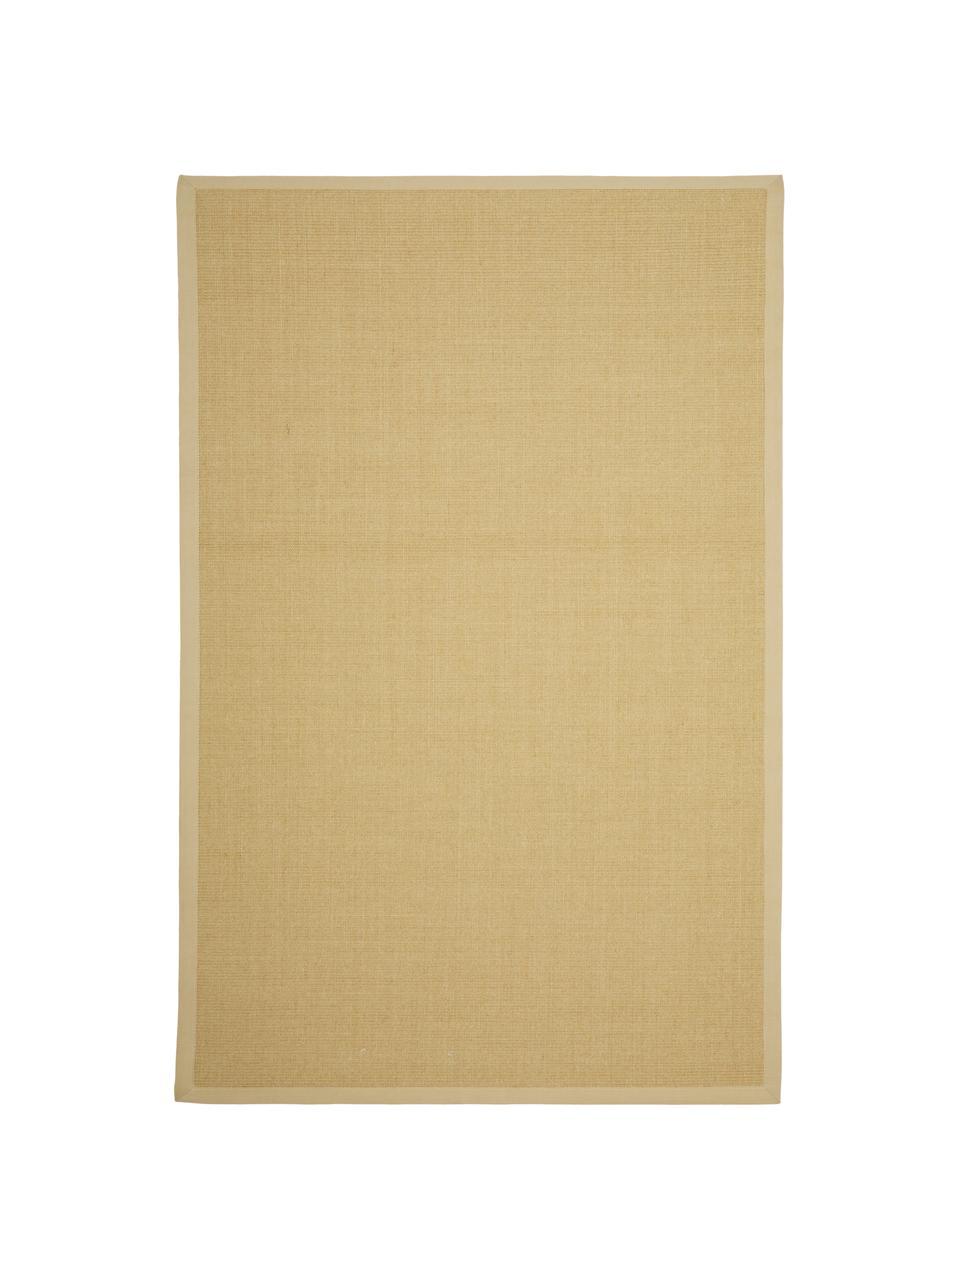 Handgefertigter Sisal-Teppich Nala, Flor: 100% Sisal, Beige, B 200 x L 300 cm (Größe L)